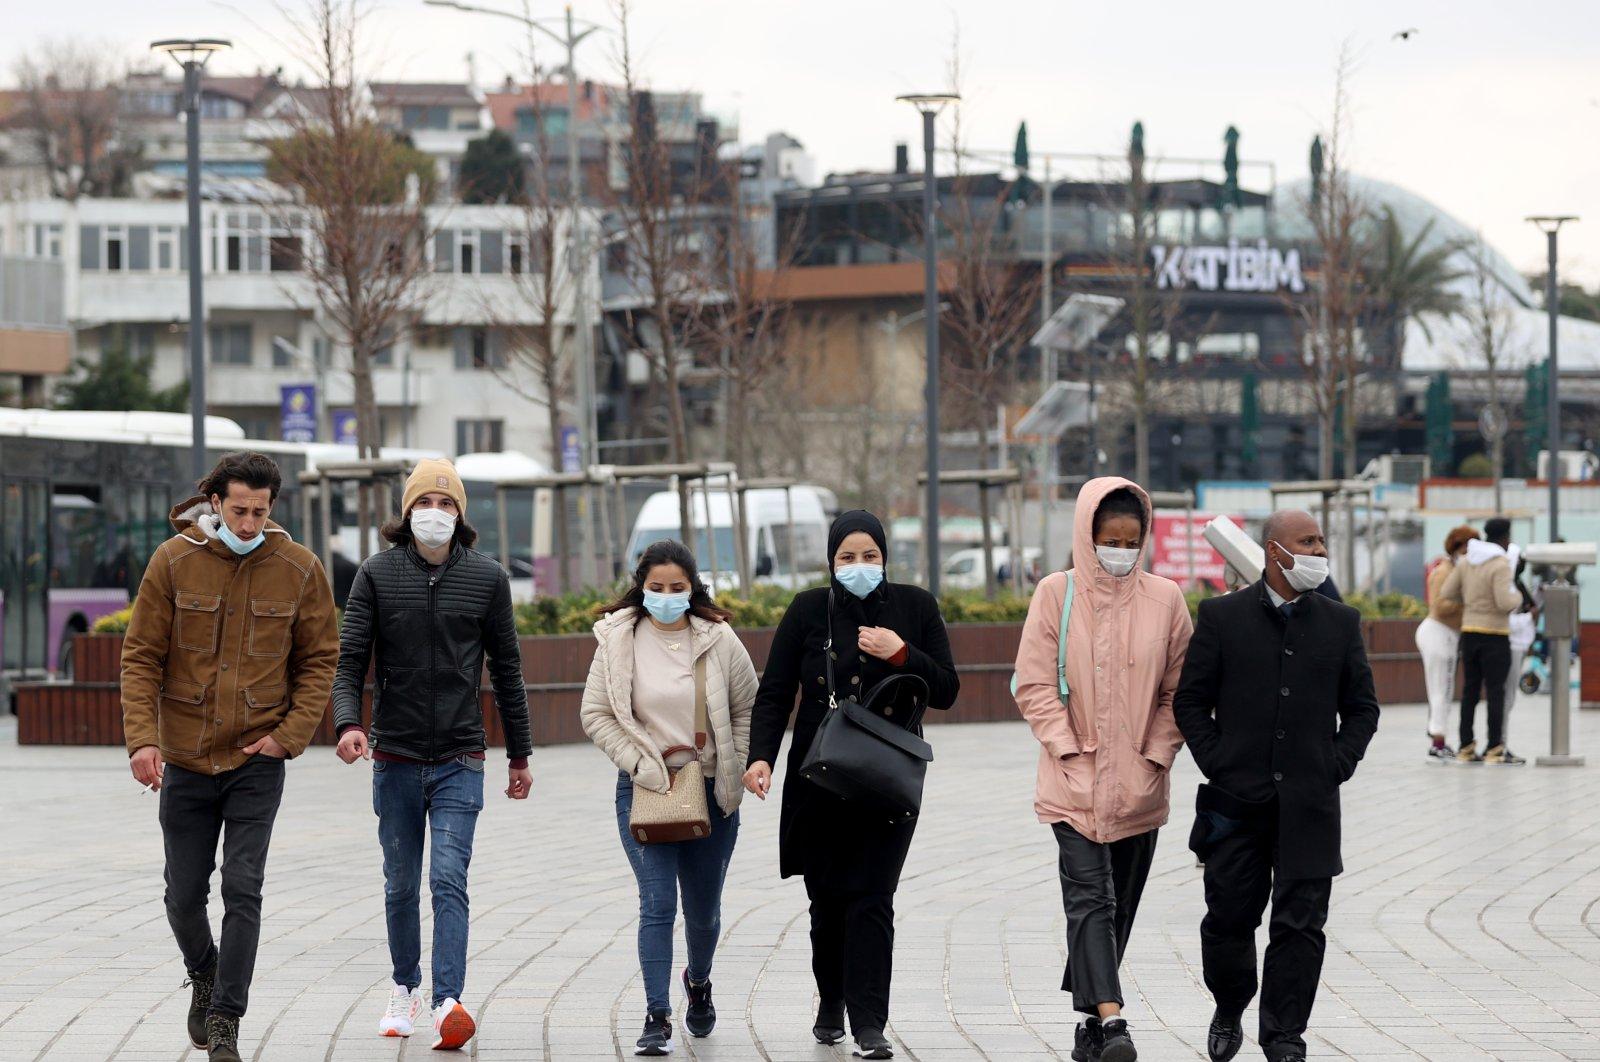 People wearing masks walk in the Üsküdar district in Turkey's largest city Istanbul, April 4, 2021. (AA Photo)